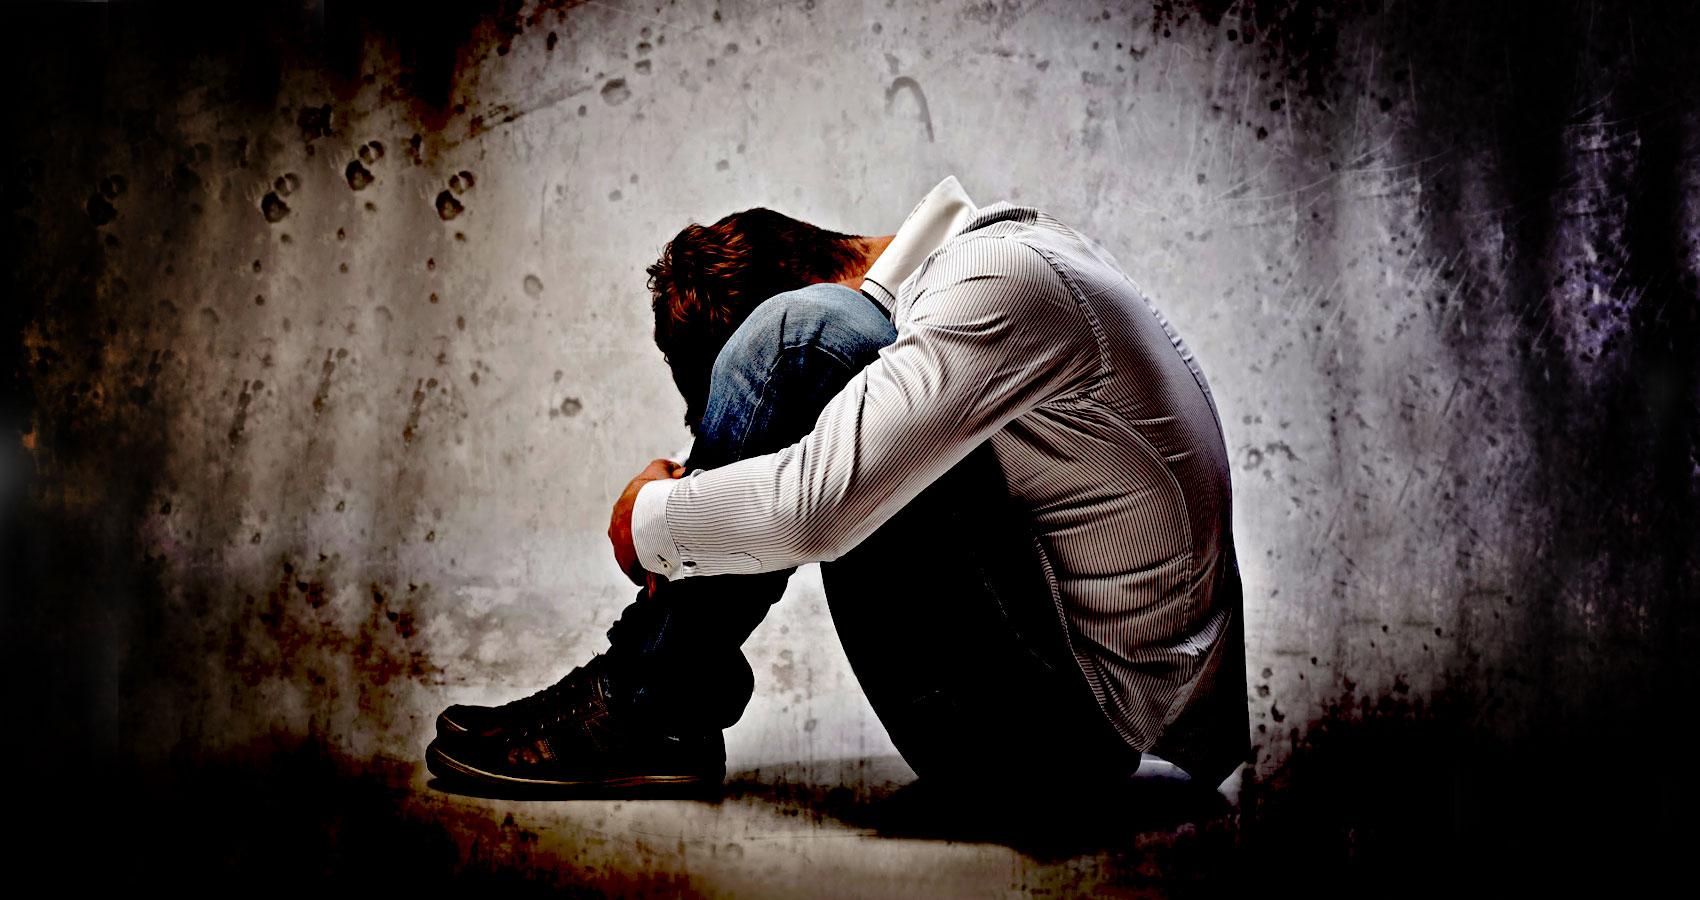 The Miserable Christian Doubt